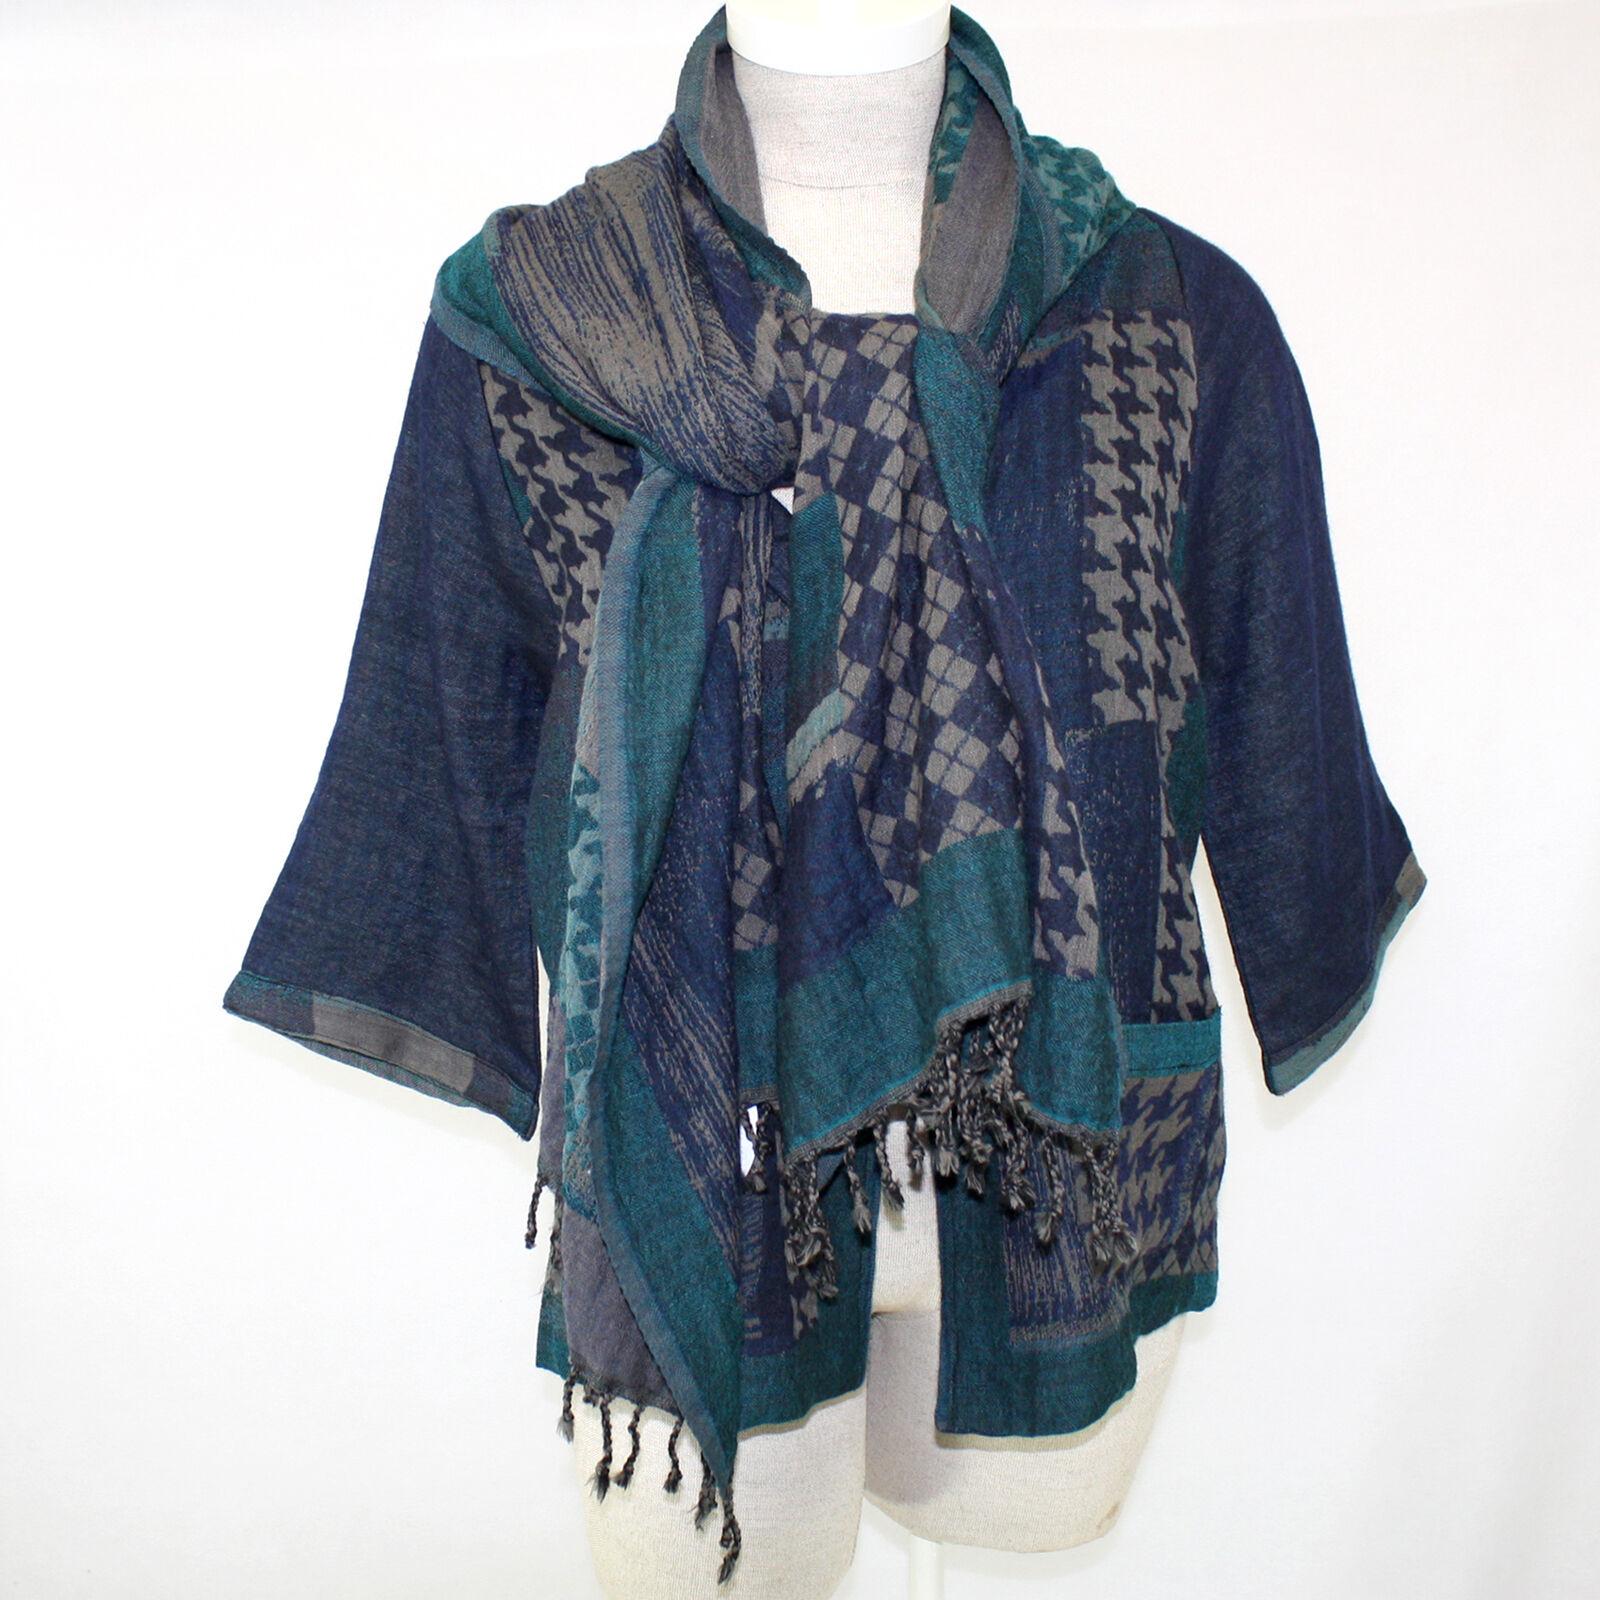 NEW NWT Parsley & Sage Plus Größe Alice Short Jacket 100% Wool Cardigan Blouse 2X